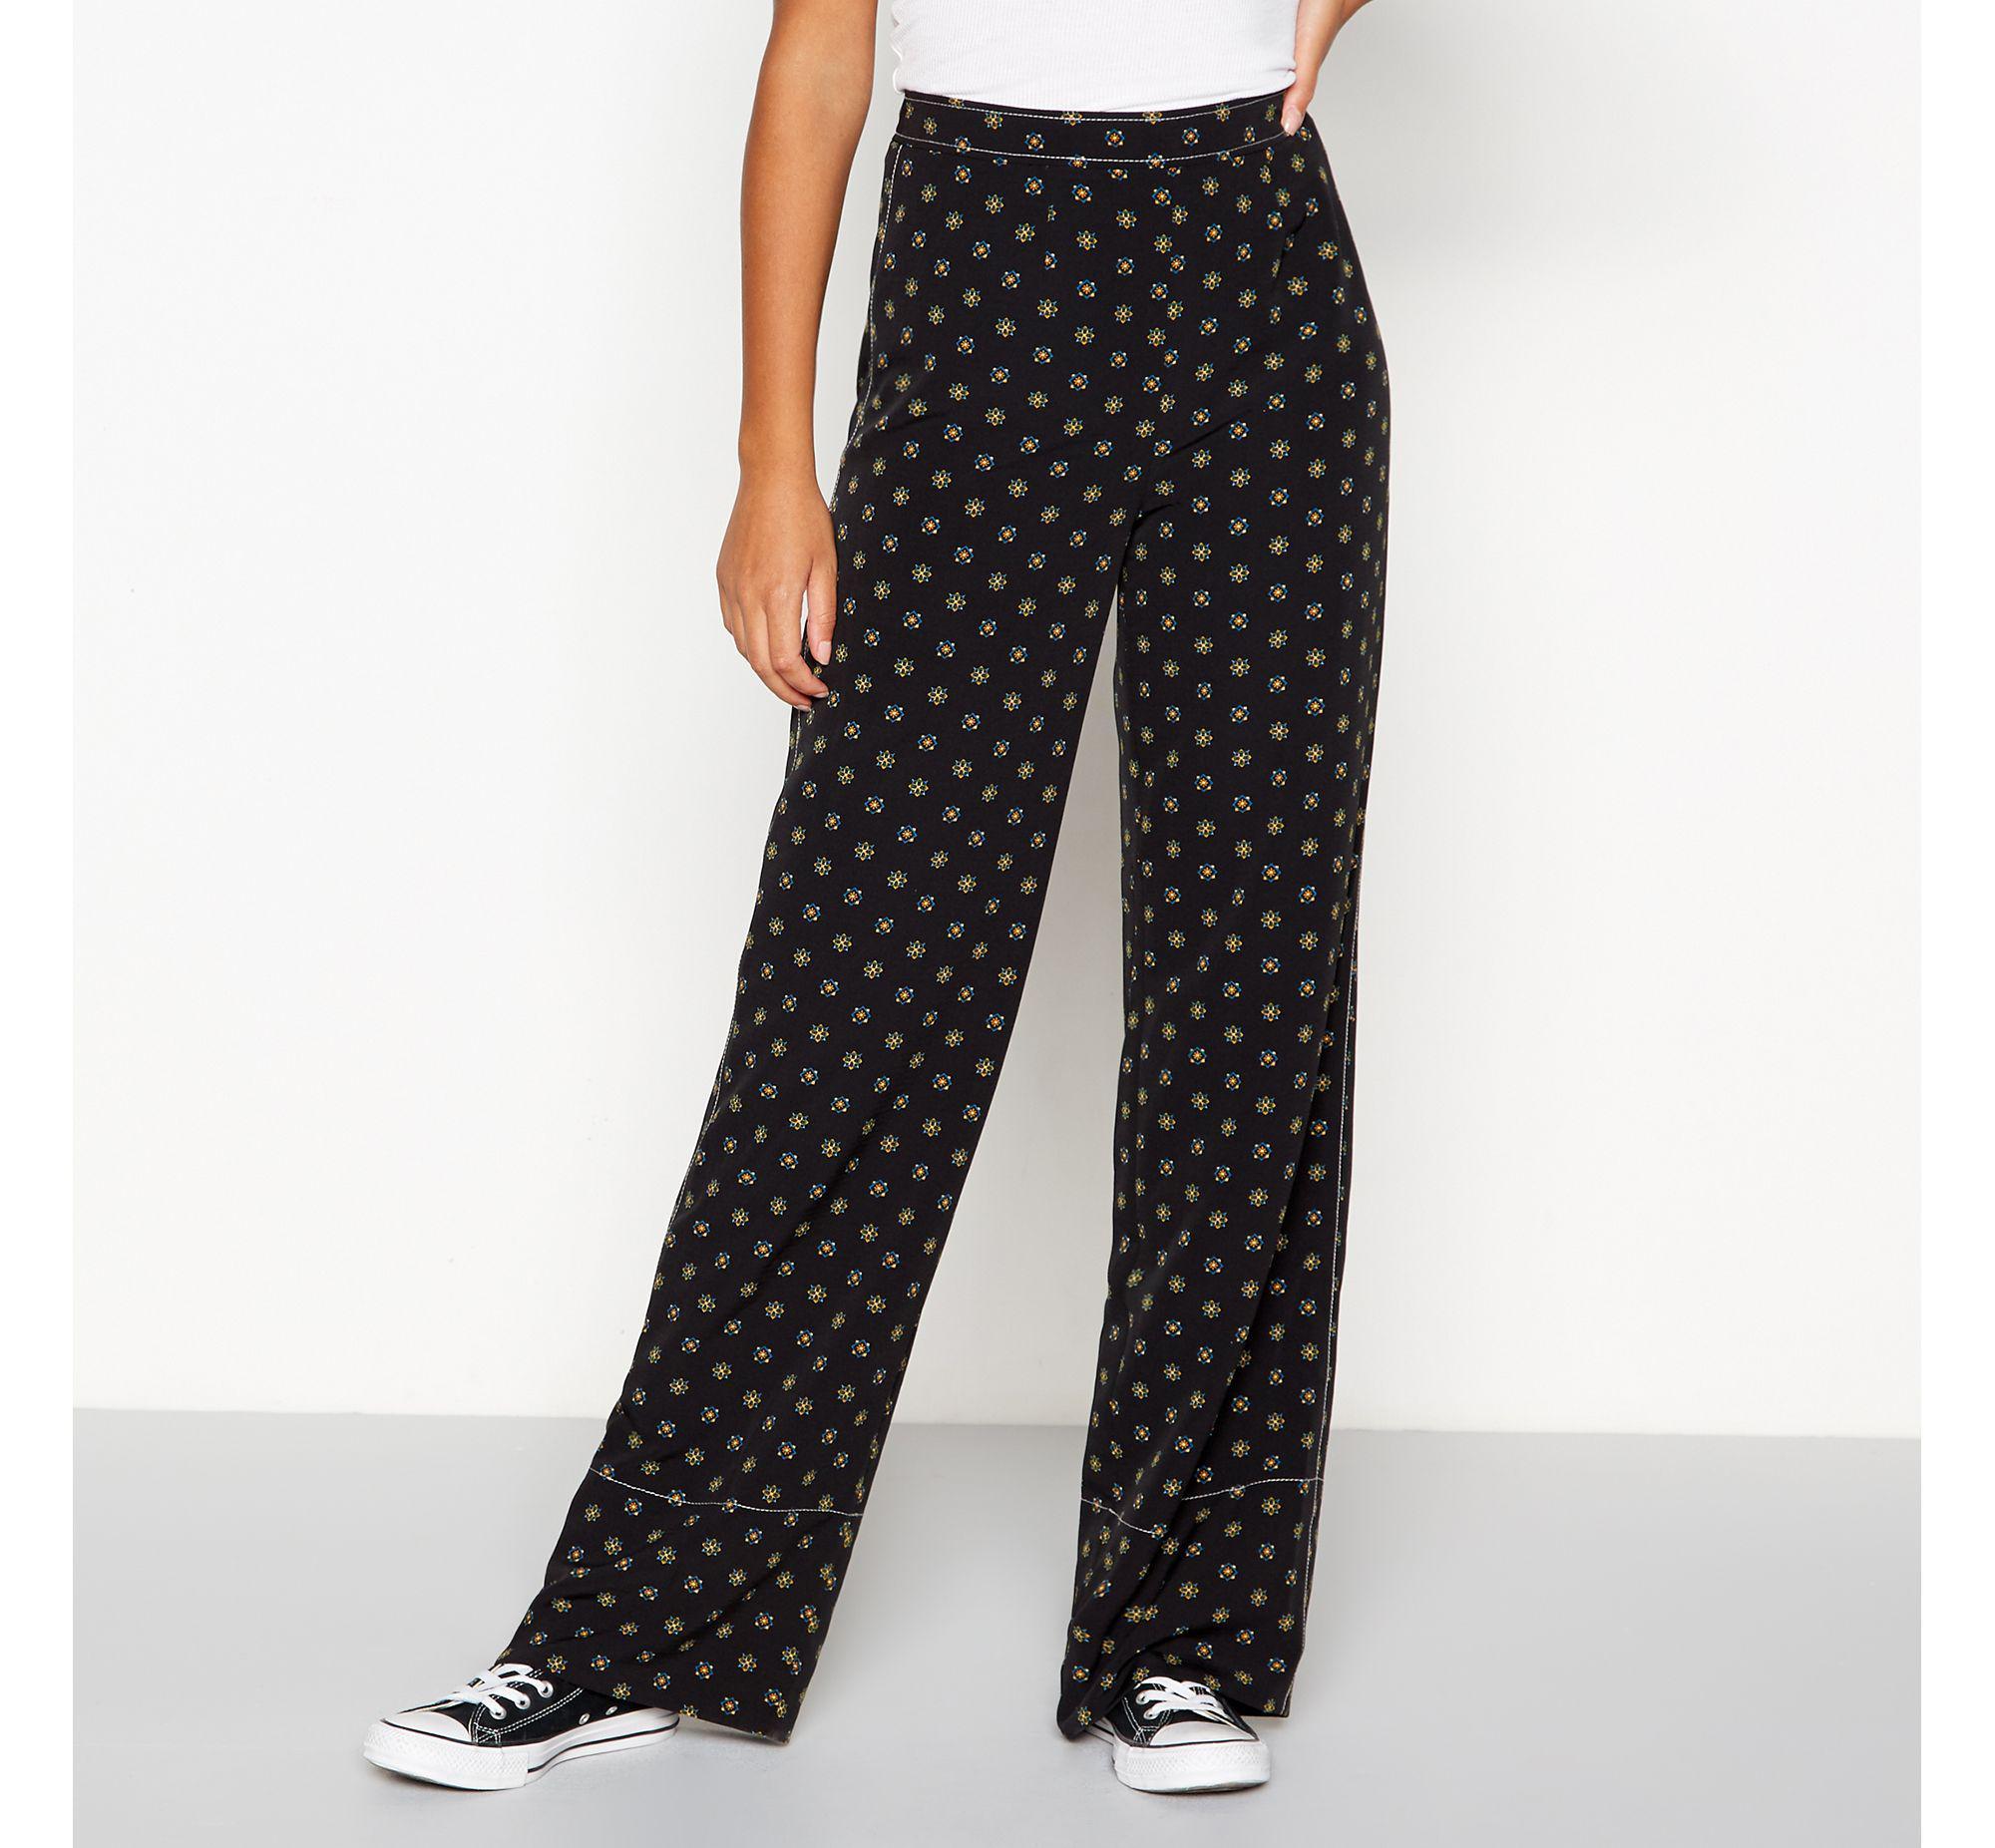 e1d71d9bc1483 Red Herring Black Tile Print Trousers in Black - Lyst